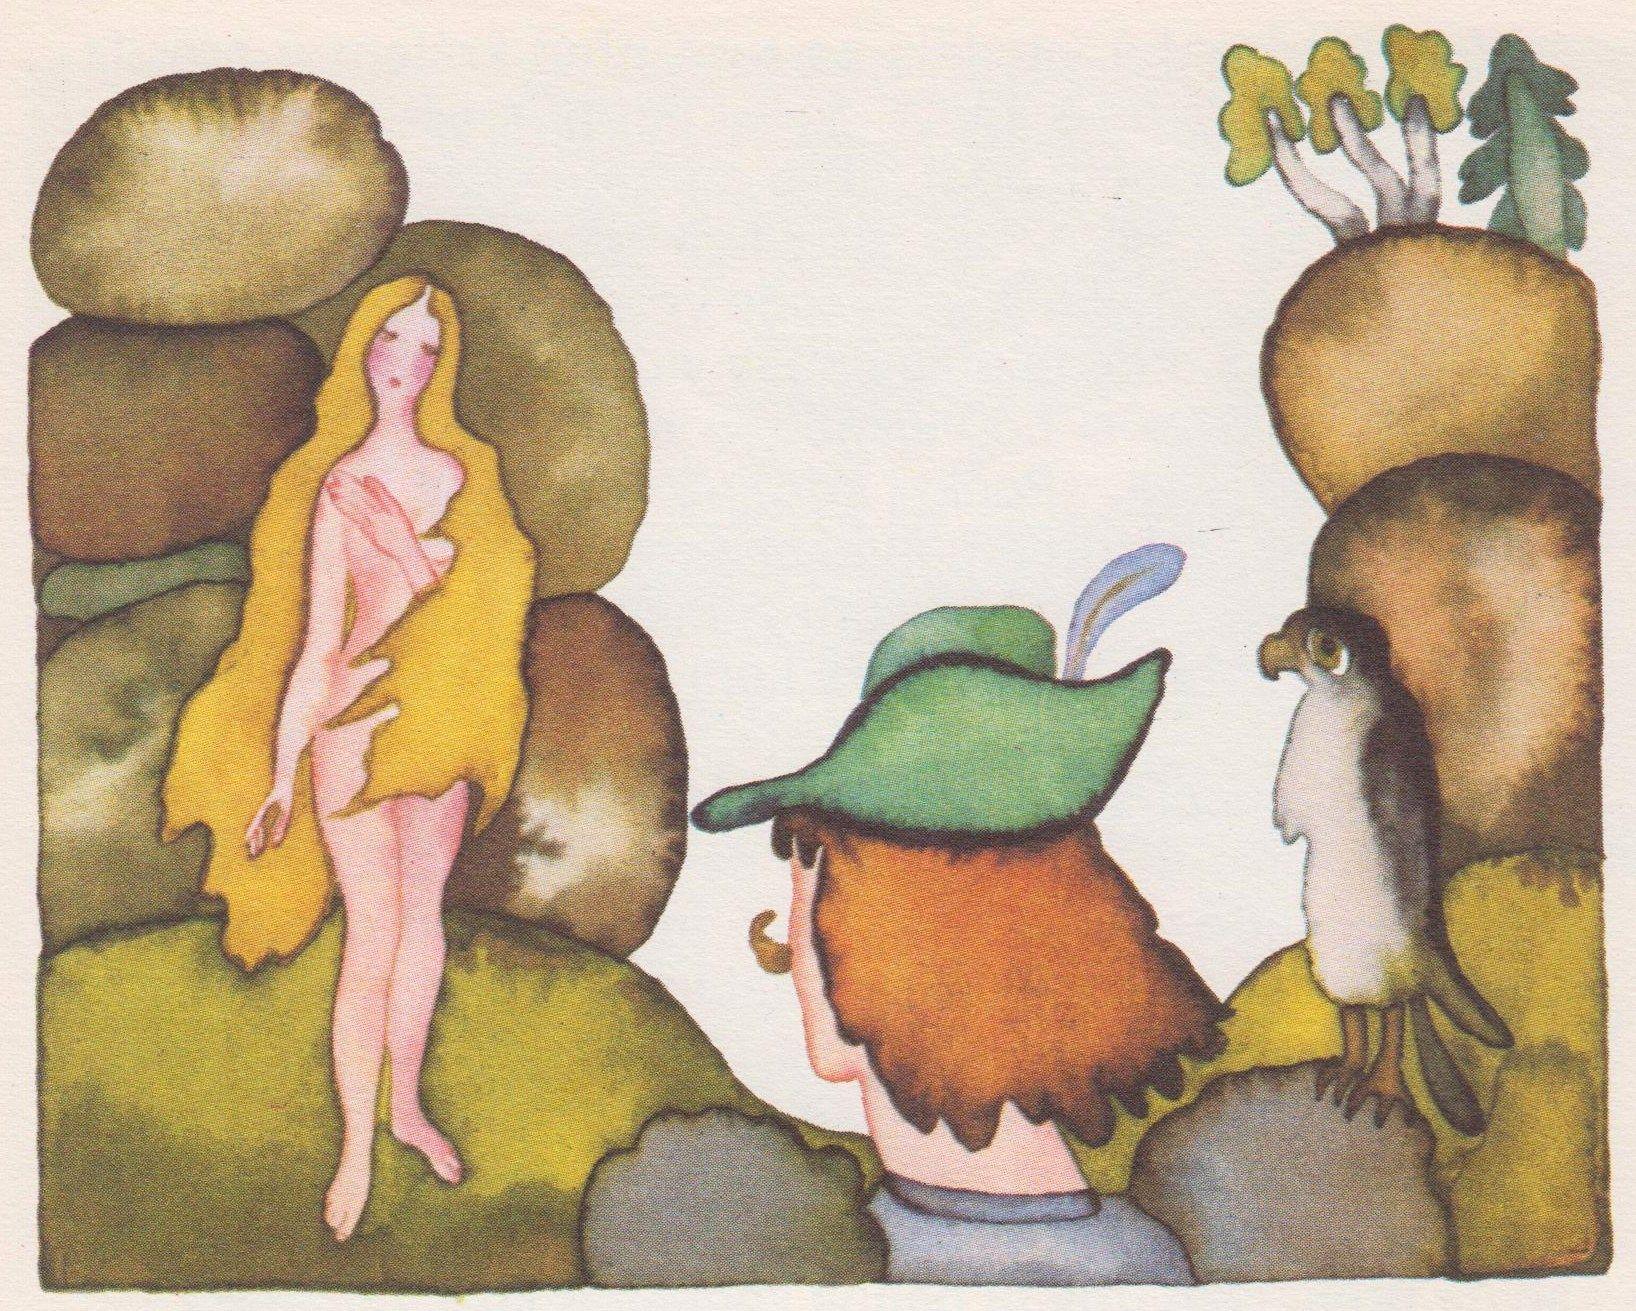 The Apple Maiden or Apple Tree Maid is known as Jabloňová Panna in Czech It is a Czech fairy tale as told by Karel Jaromr Erben